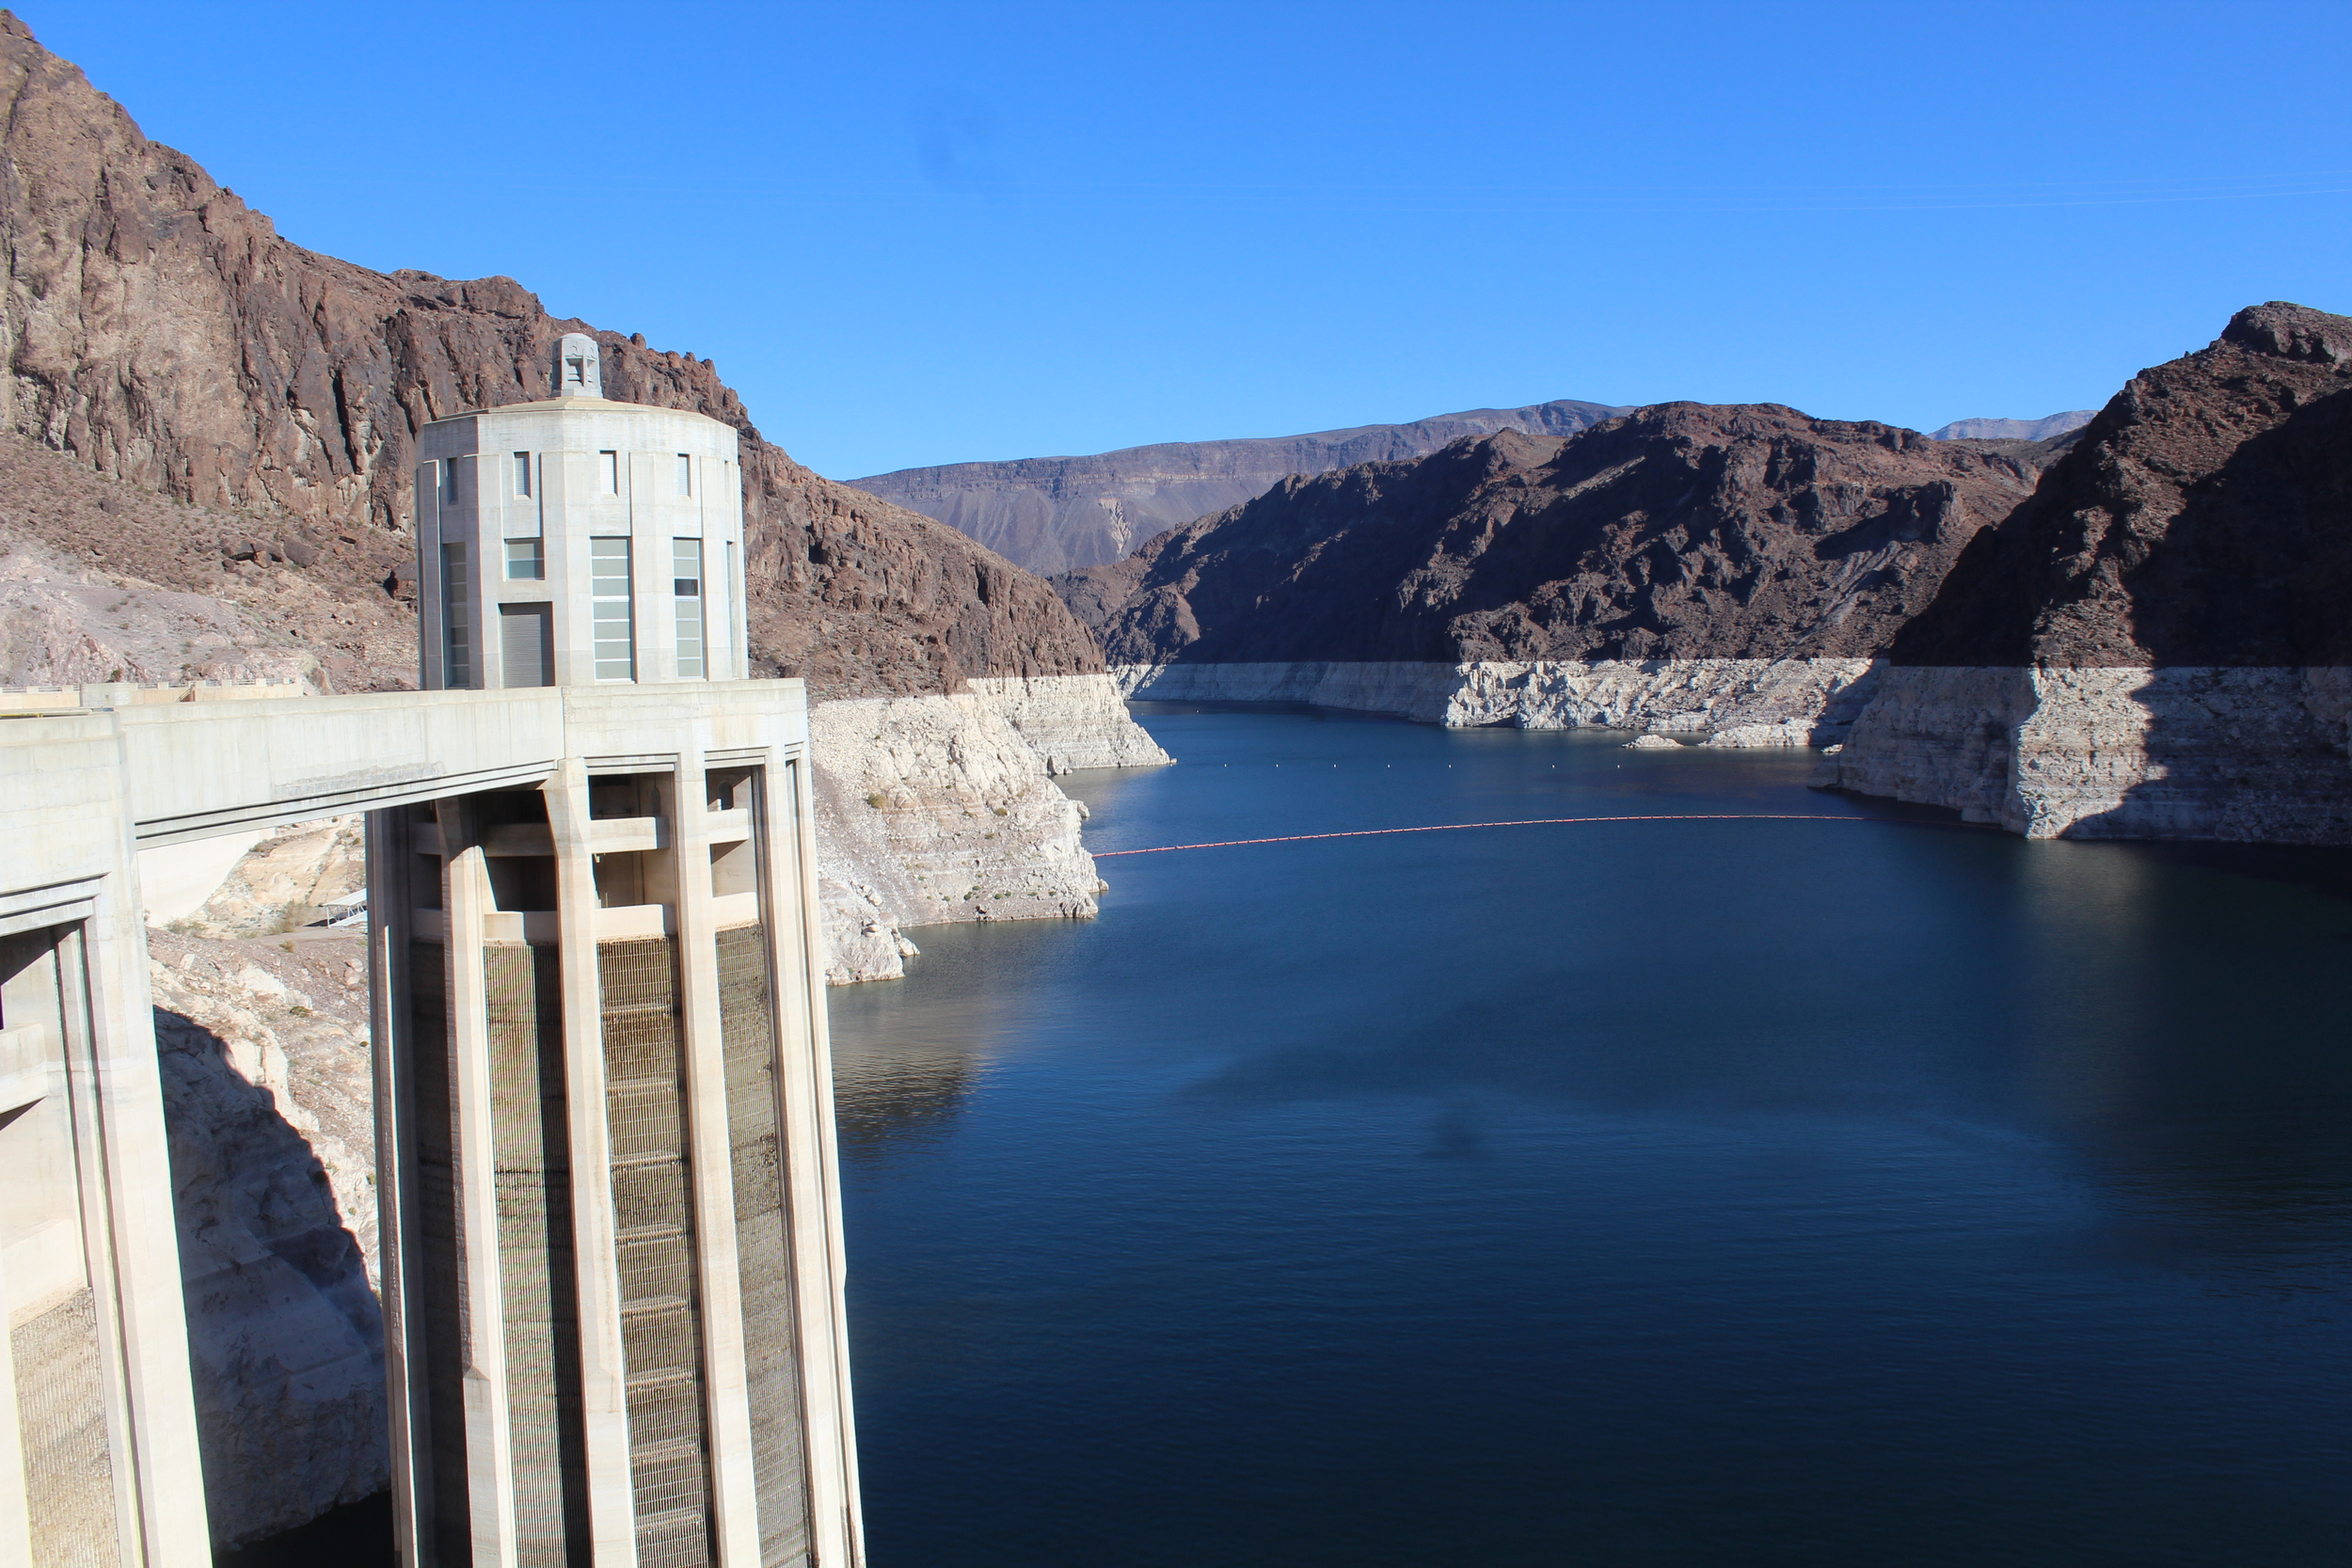 Hoover Dam - Lake Mead Side